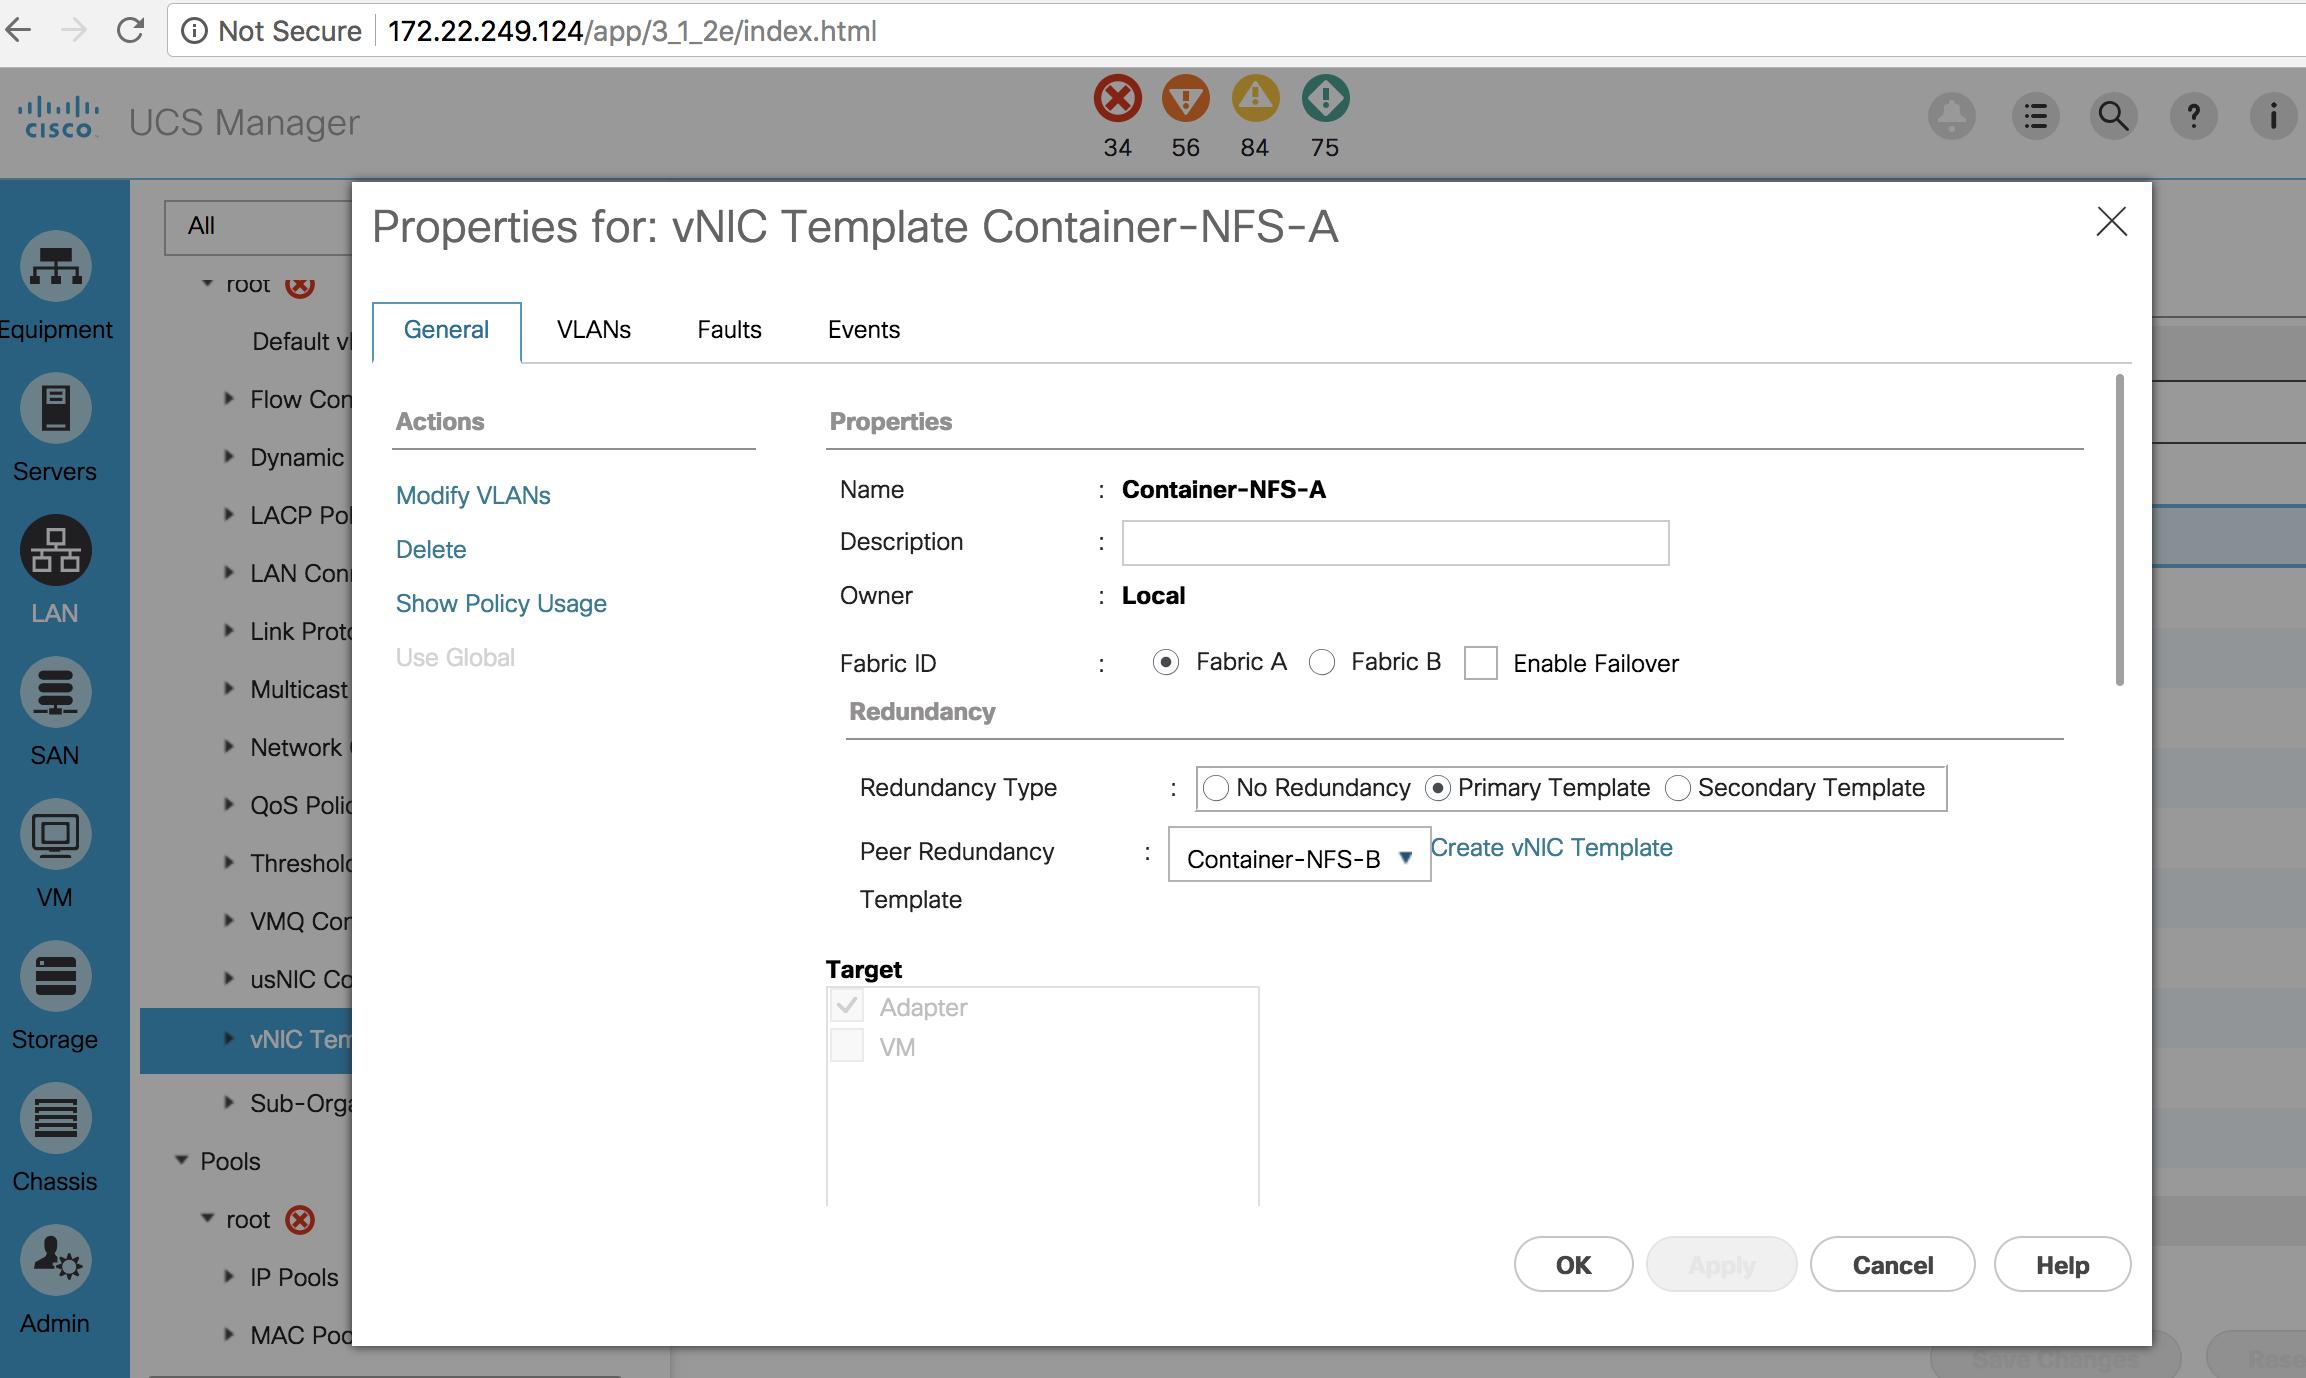 ucs_vnic_template fails with UCS Platform Emulator 3 1 · Issue #76